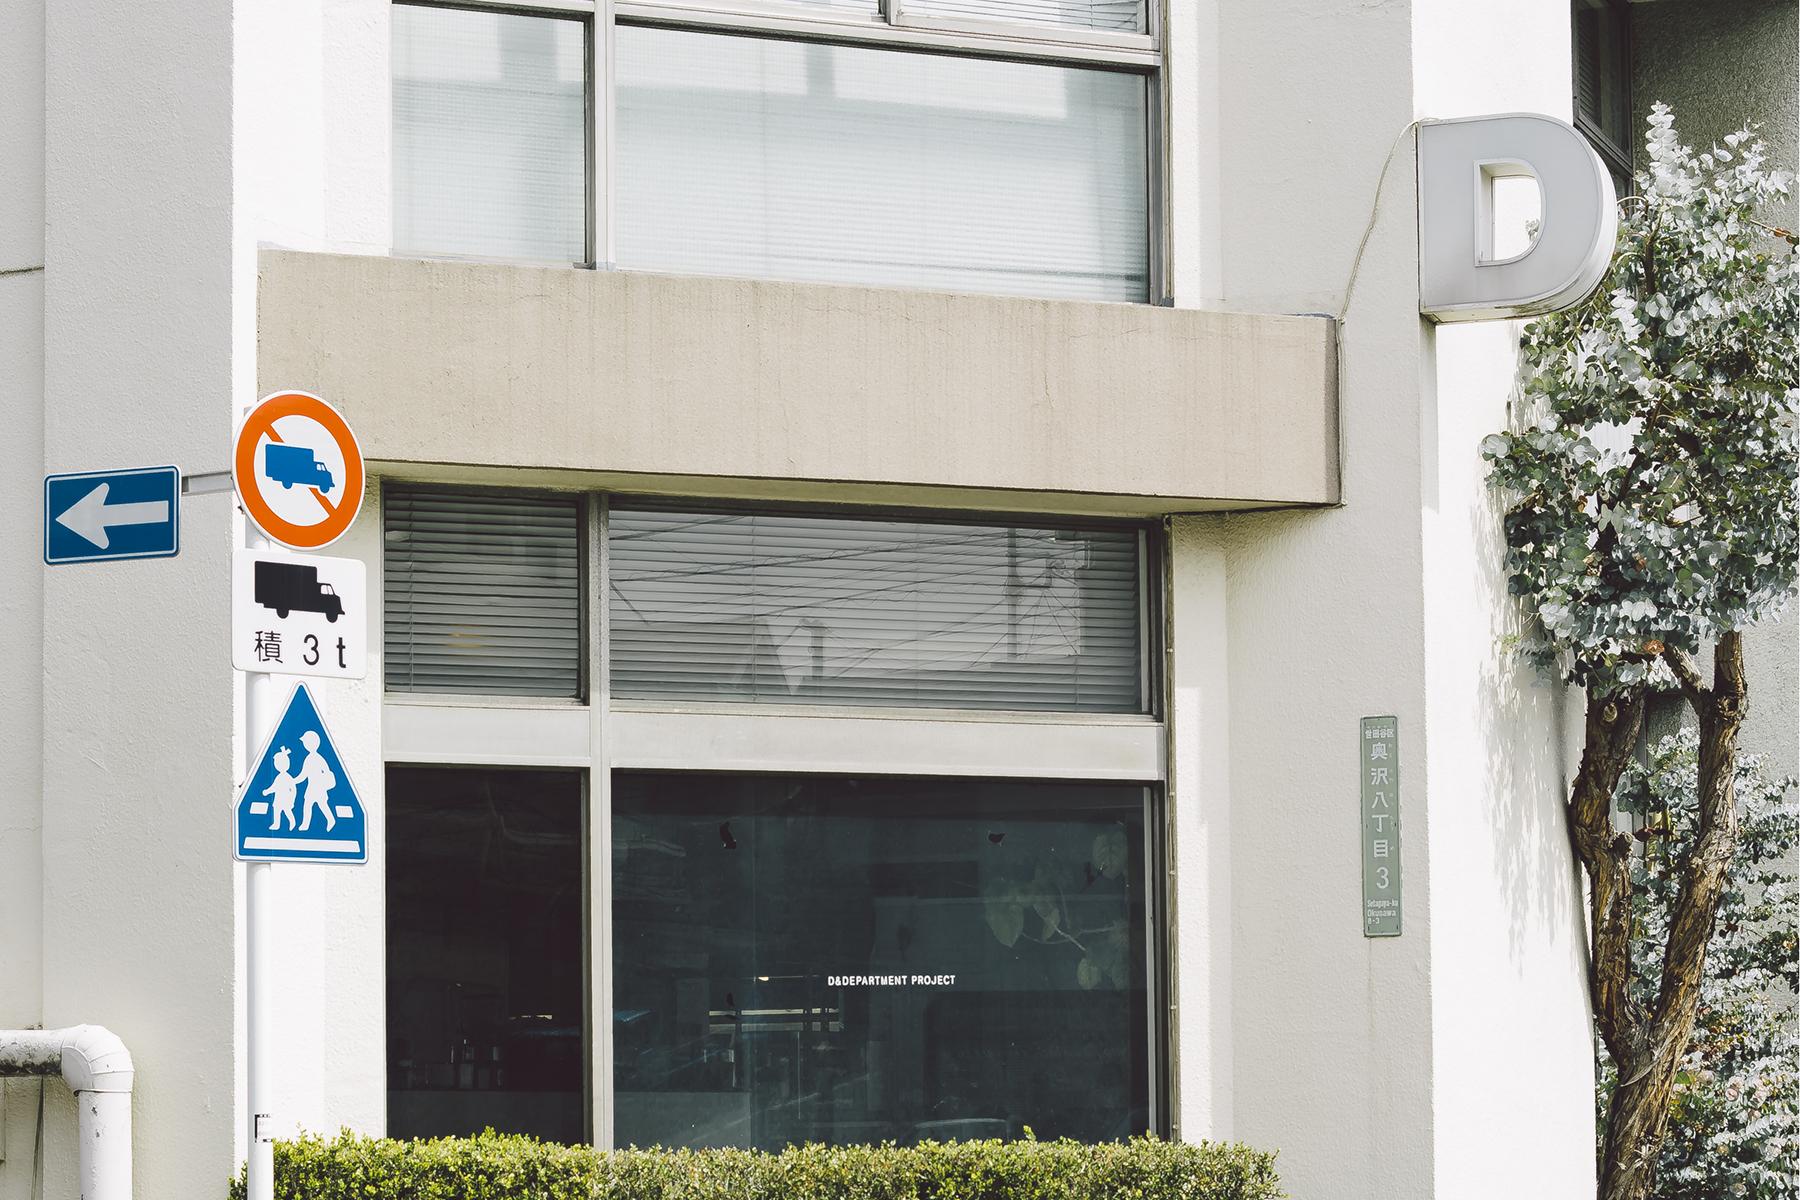 D&Department 東京店位於九品仏駅步行約10分鐘路程,雖然與自由之丘僅有1站之隔,但能馬上感受到與「市中心」截然不同的住宅氣氛。